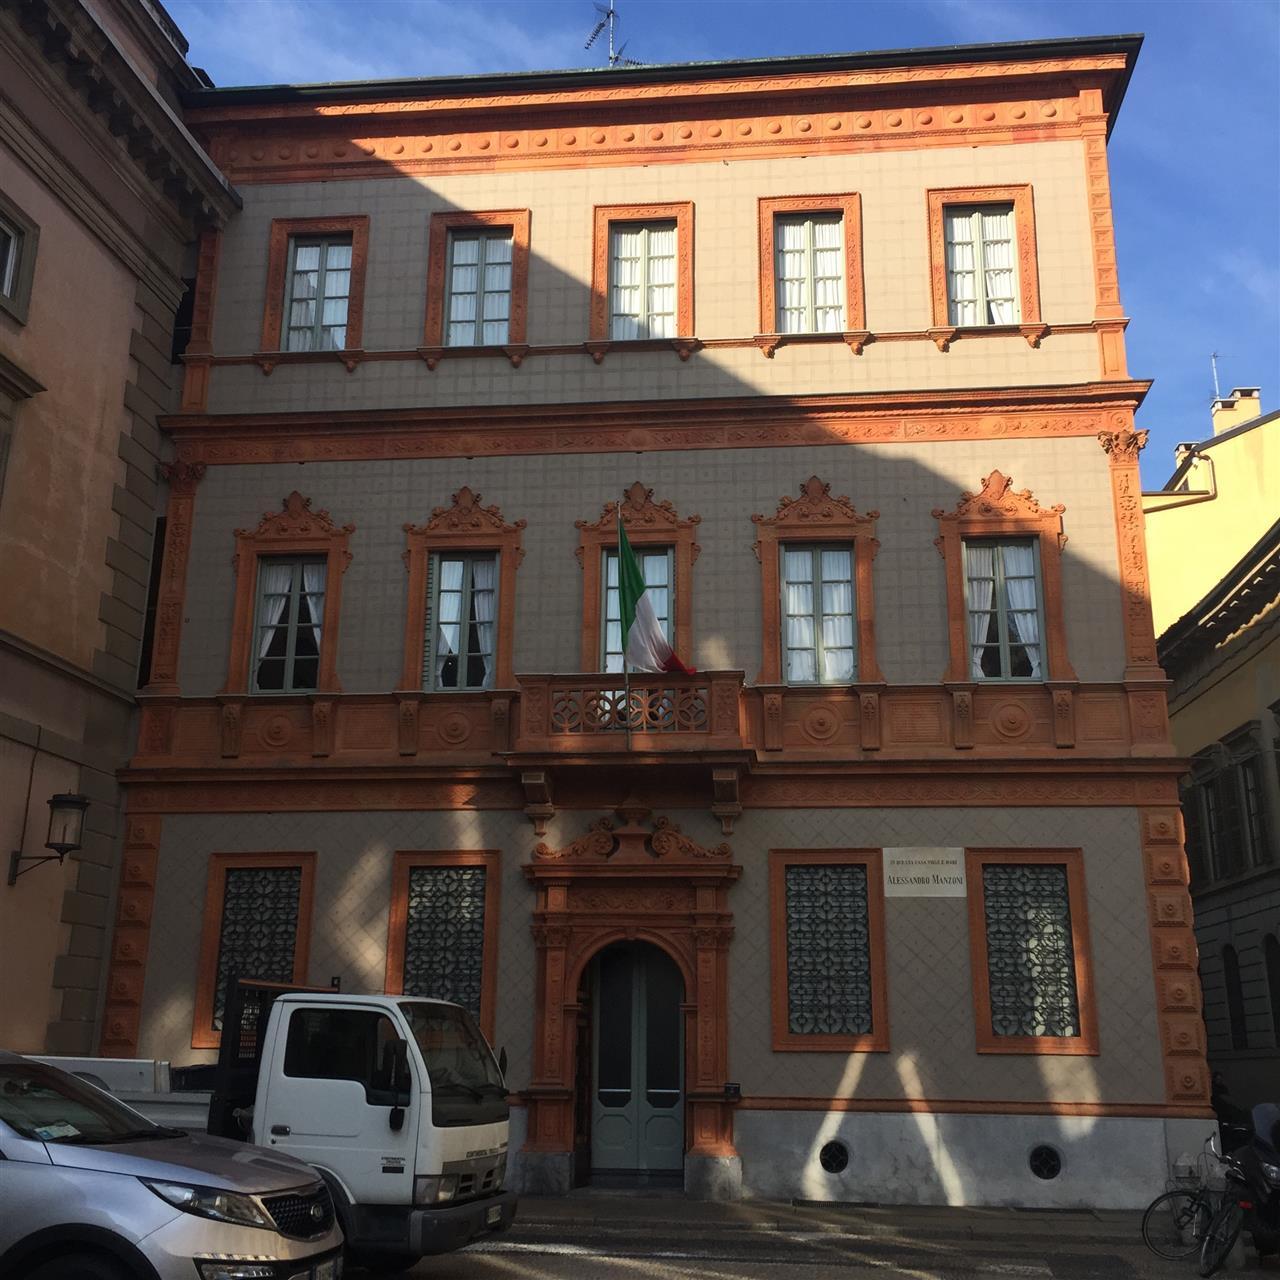 The house of #AlessandroManzoni #Milano